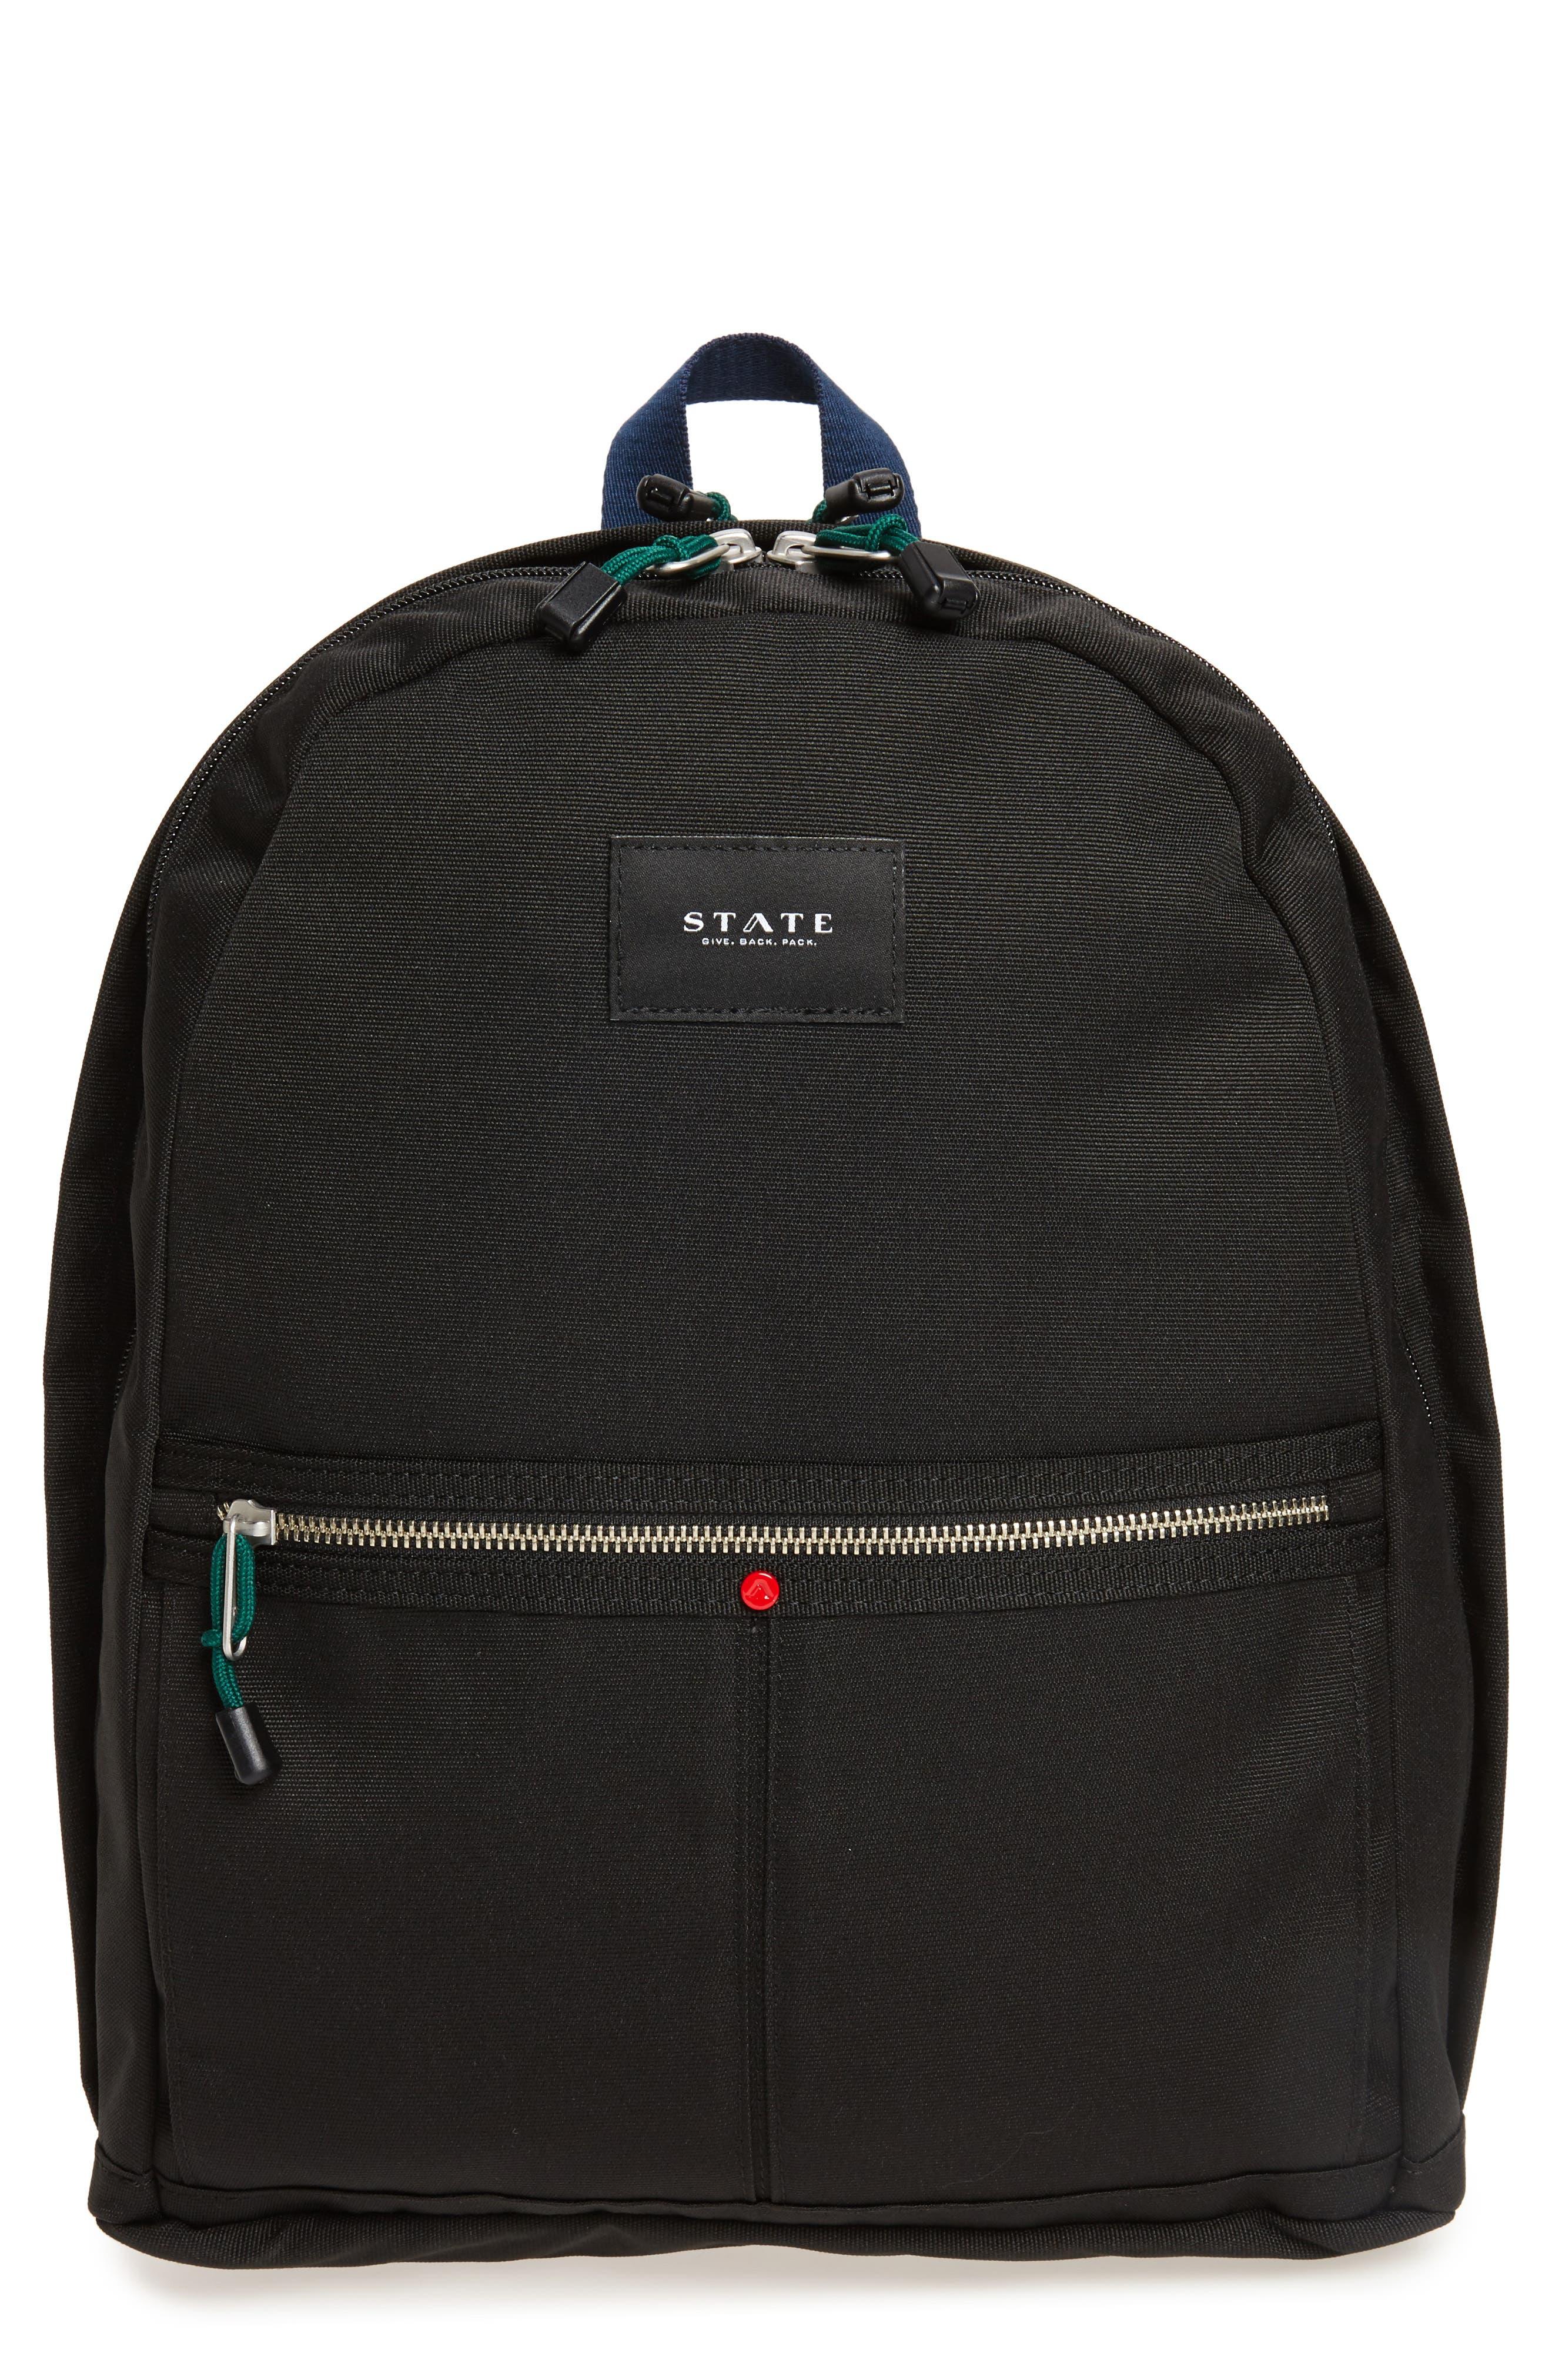 STATE BAGS Kent Backpack, Main, color, BLACK